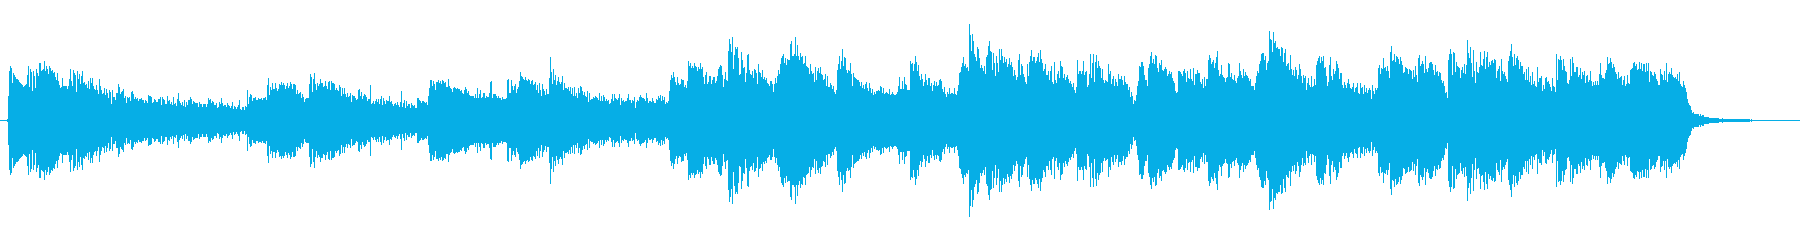 Lets Enjoy 30秒の再生済みの波形